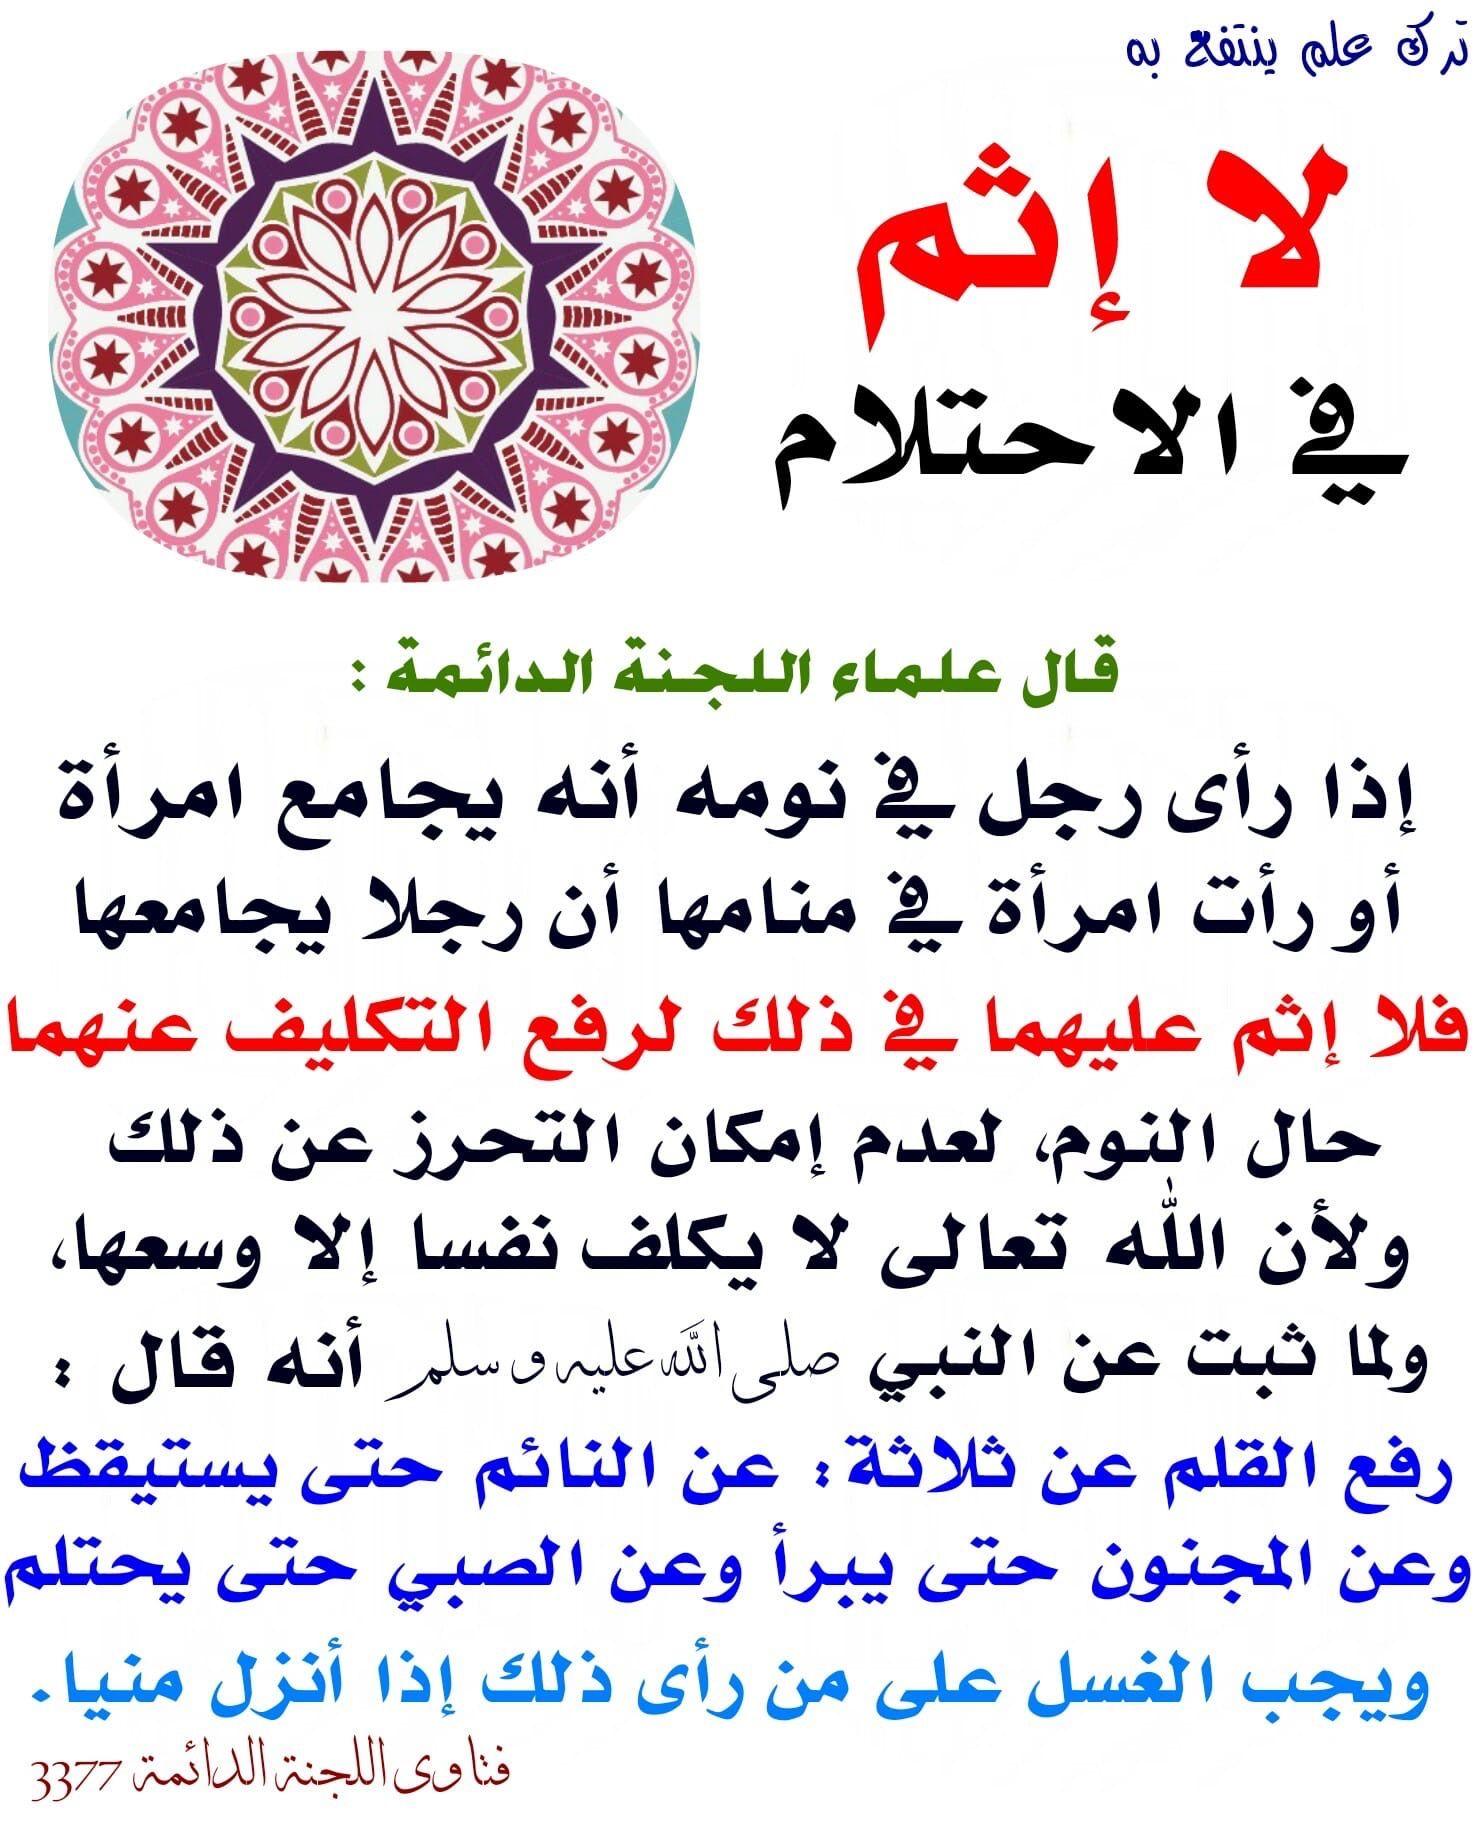 Pin By Hassanate Tazi On فتاوى Islamic Qoutes Islam Qoutes